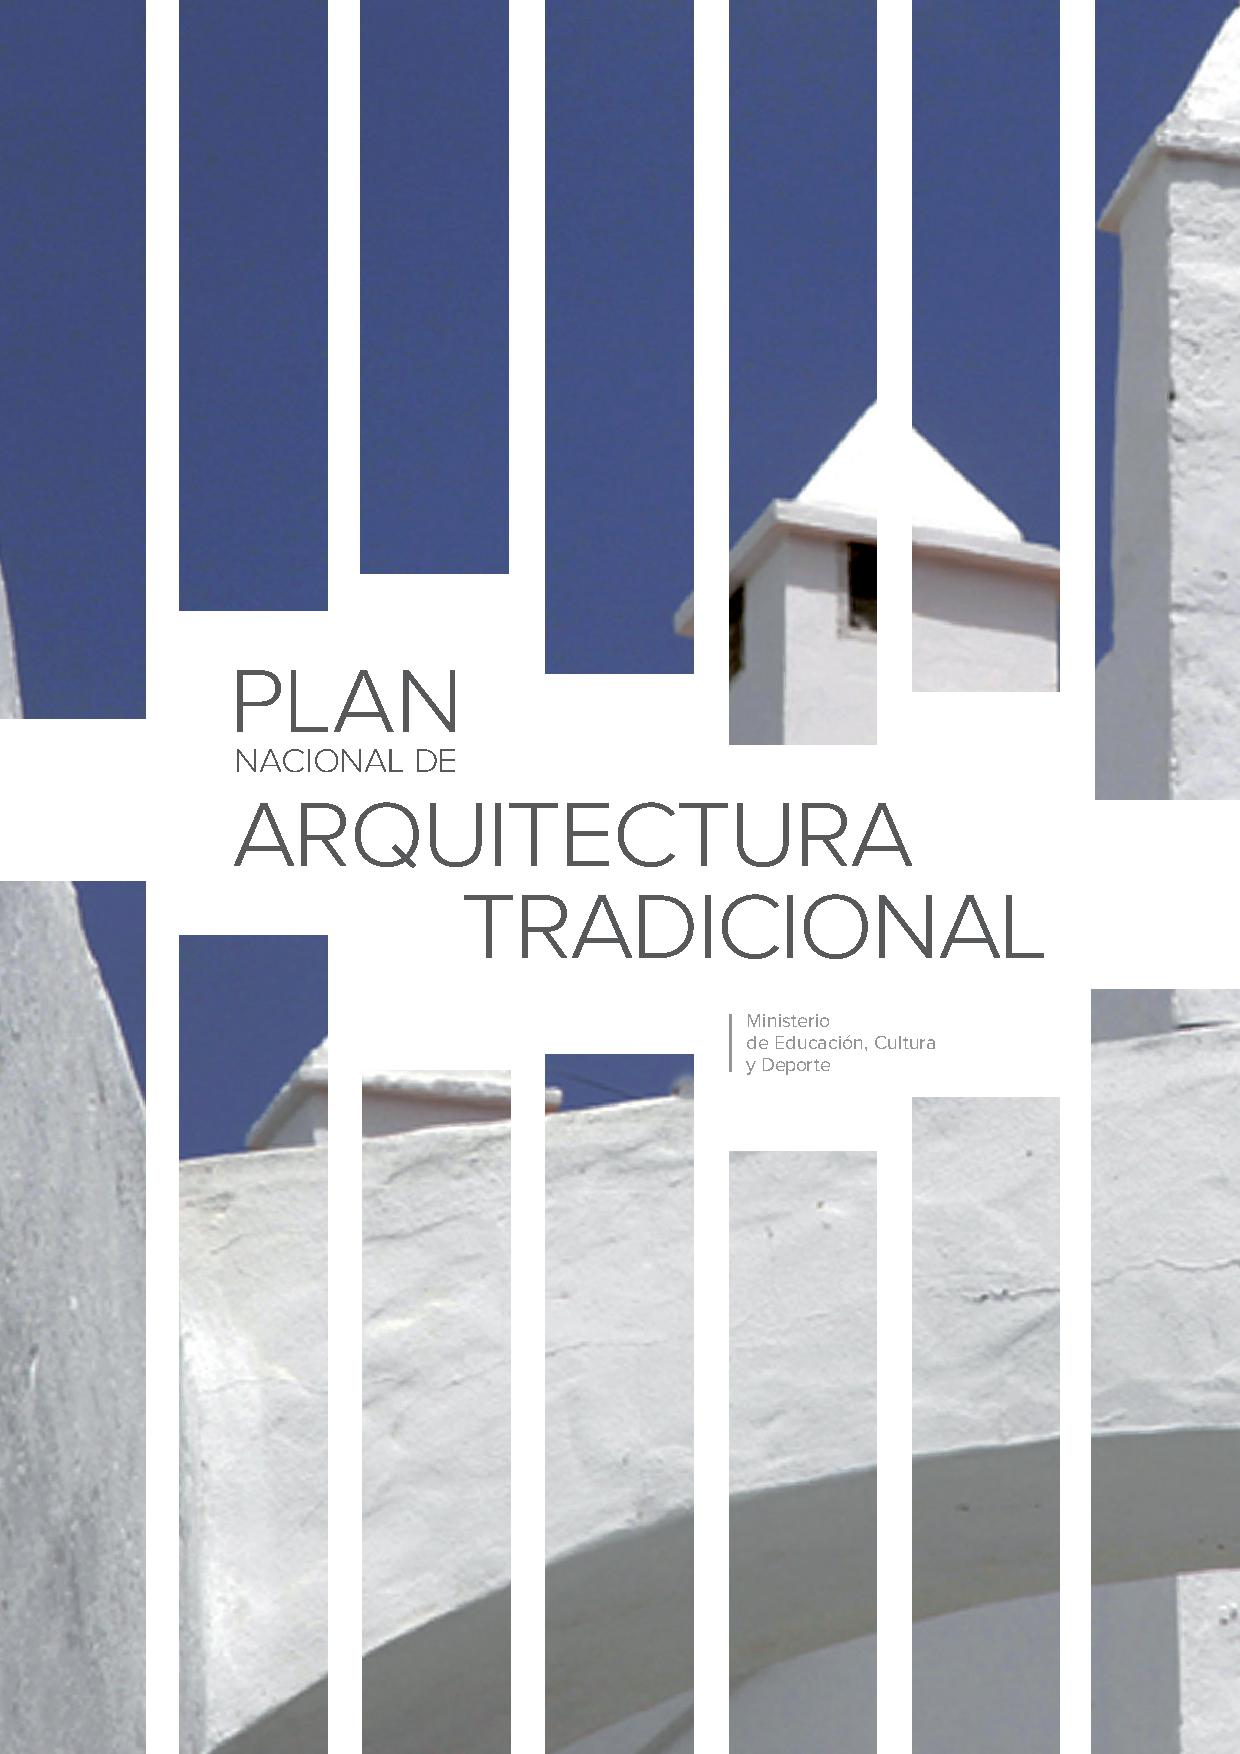 Plan nacional de arquitectura tradicional publicaciones for Plan de arquitectura